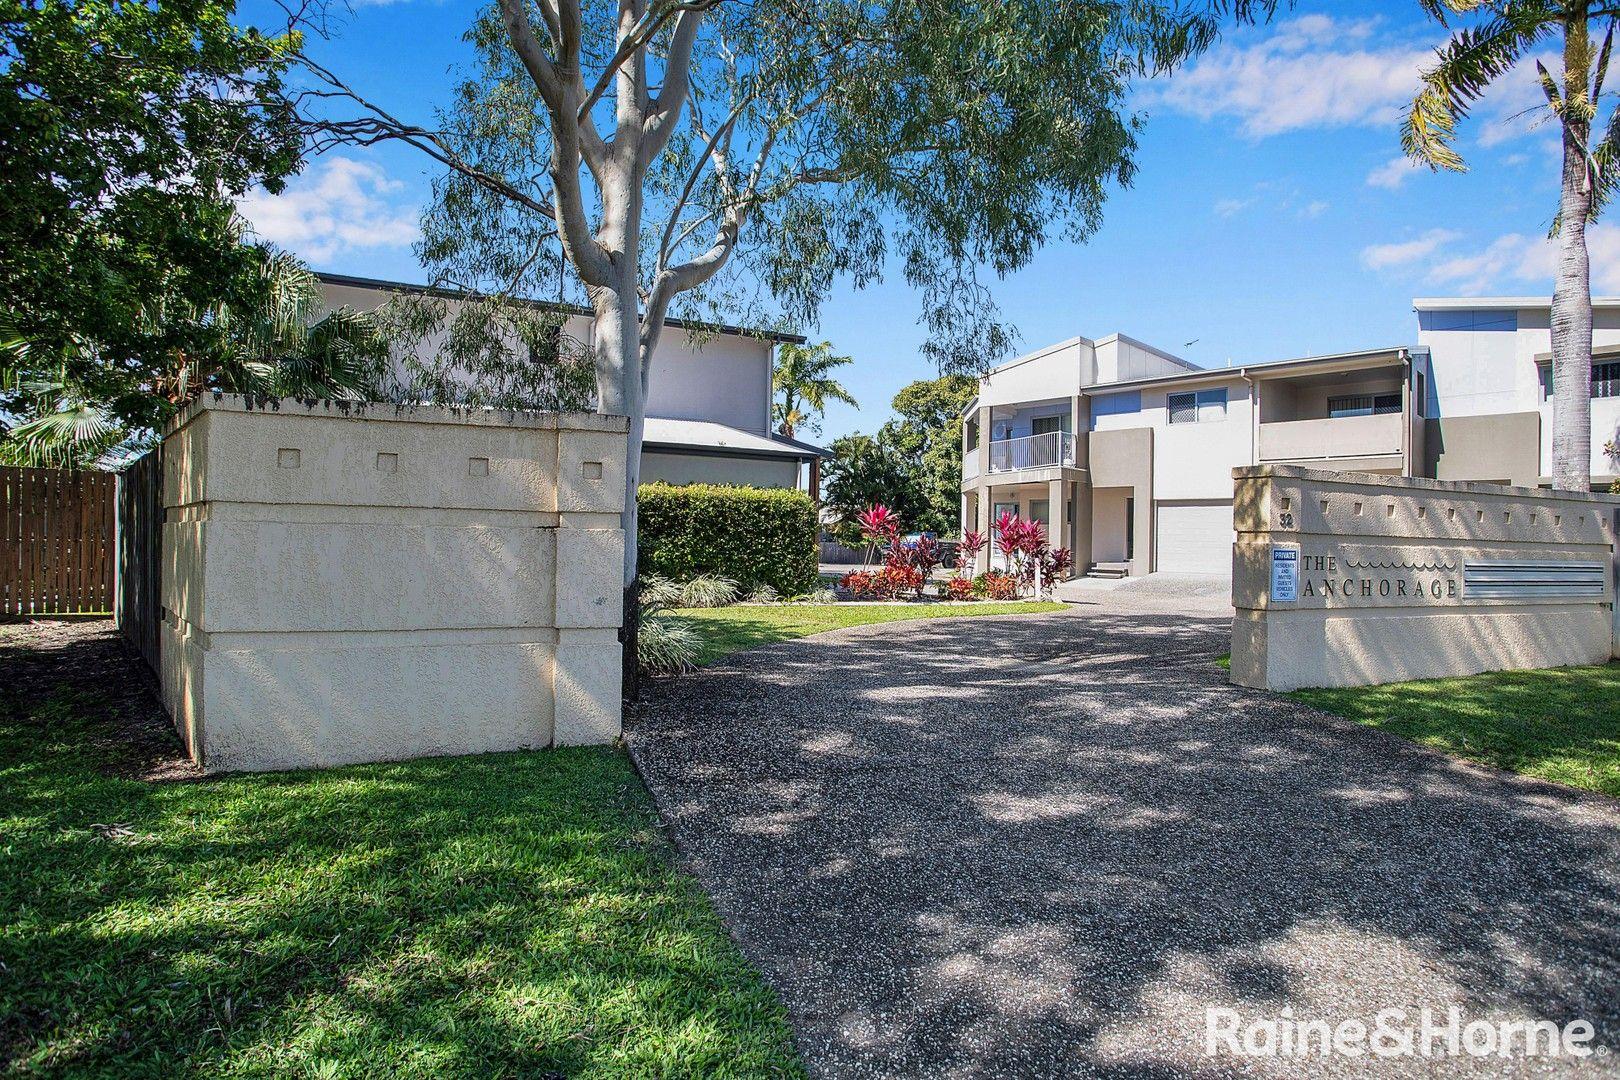 4/32 Bassett Street, North Mackay QLD 4740, Image 0